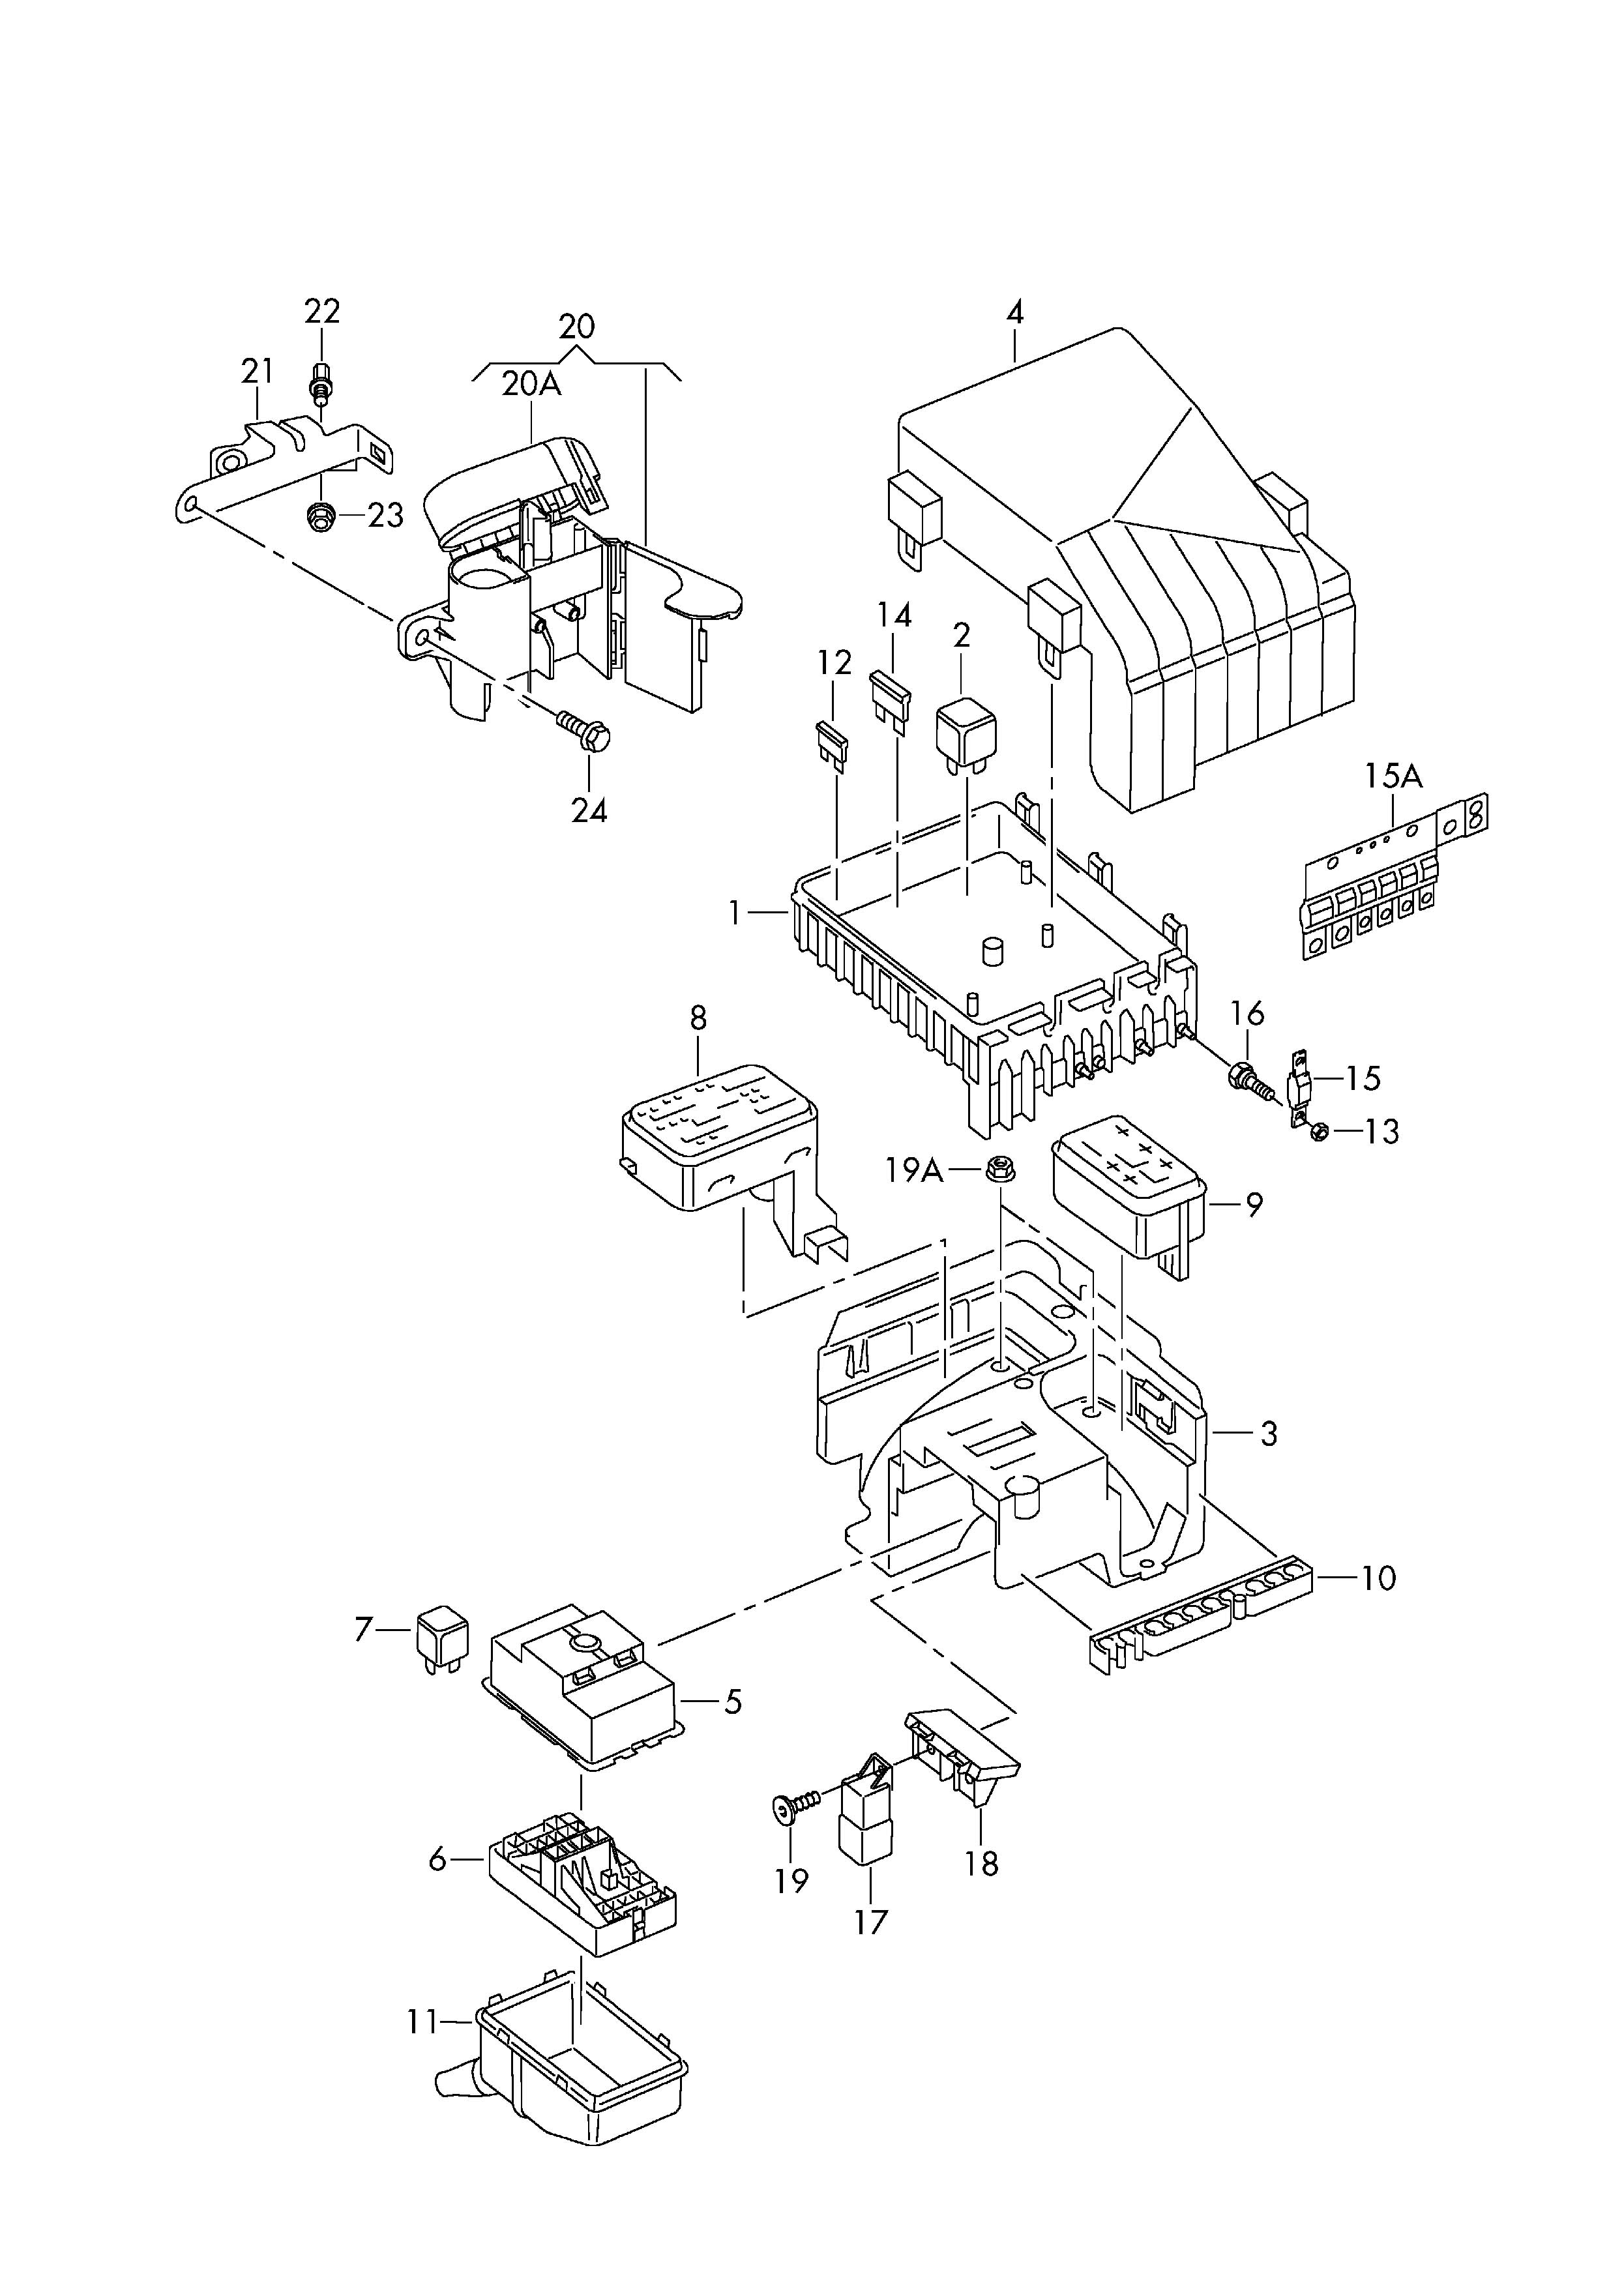 Volkswagen Touareg 2004 Fuse Box - All Diagram Schematics